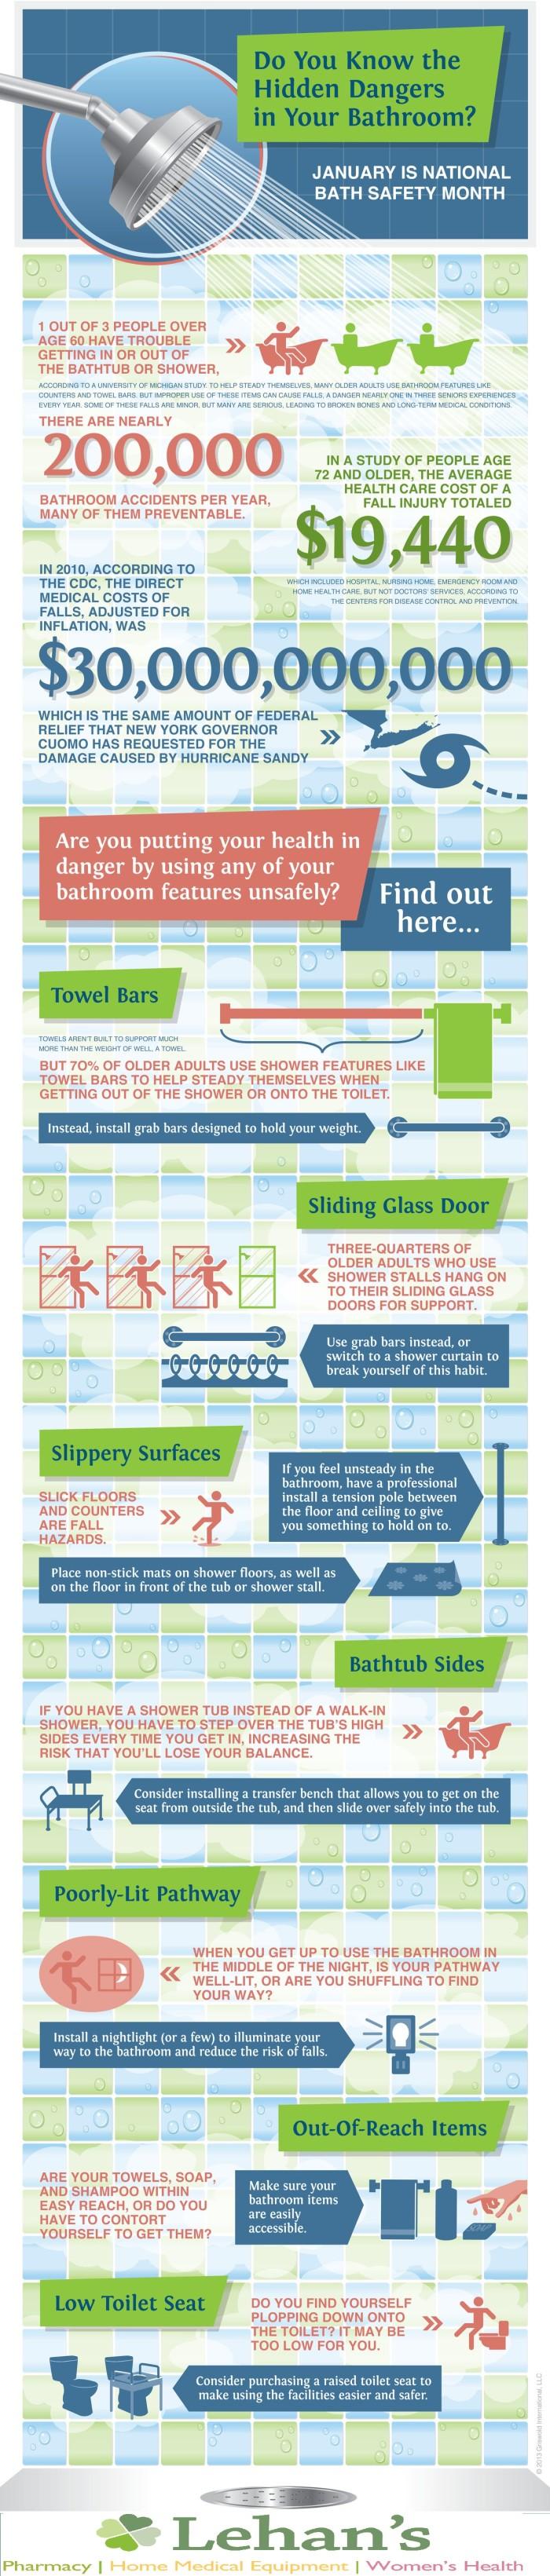 BathSafety_Infographic 14x54